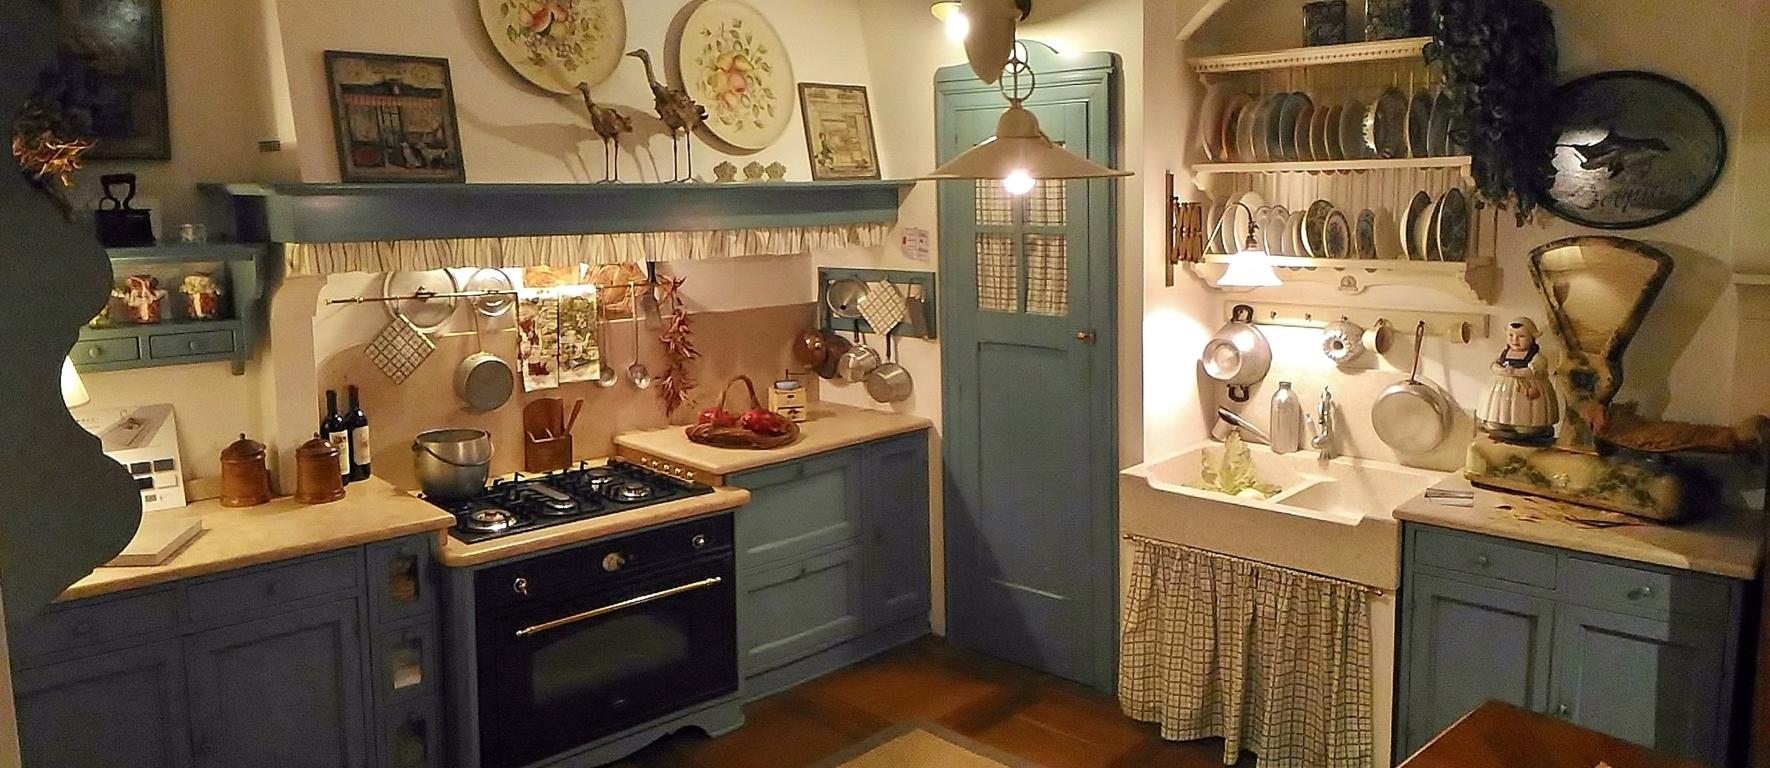 Cucina marchi group doria scontata al 40 cucine a - Cucine marchi prezzi ...